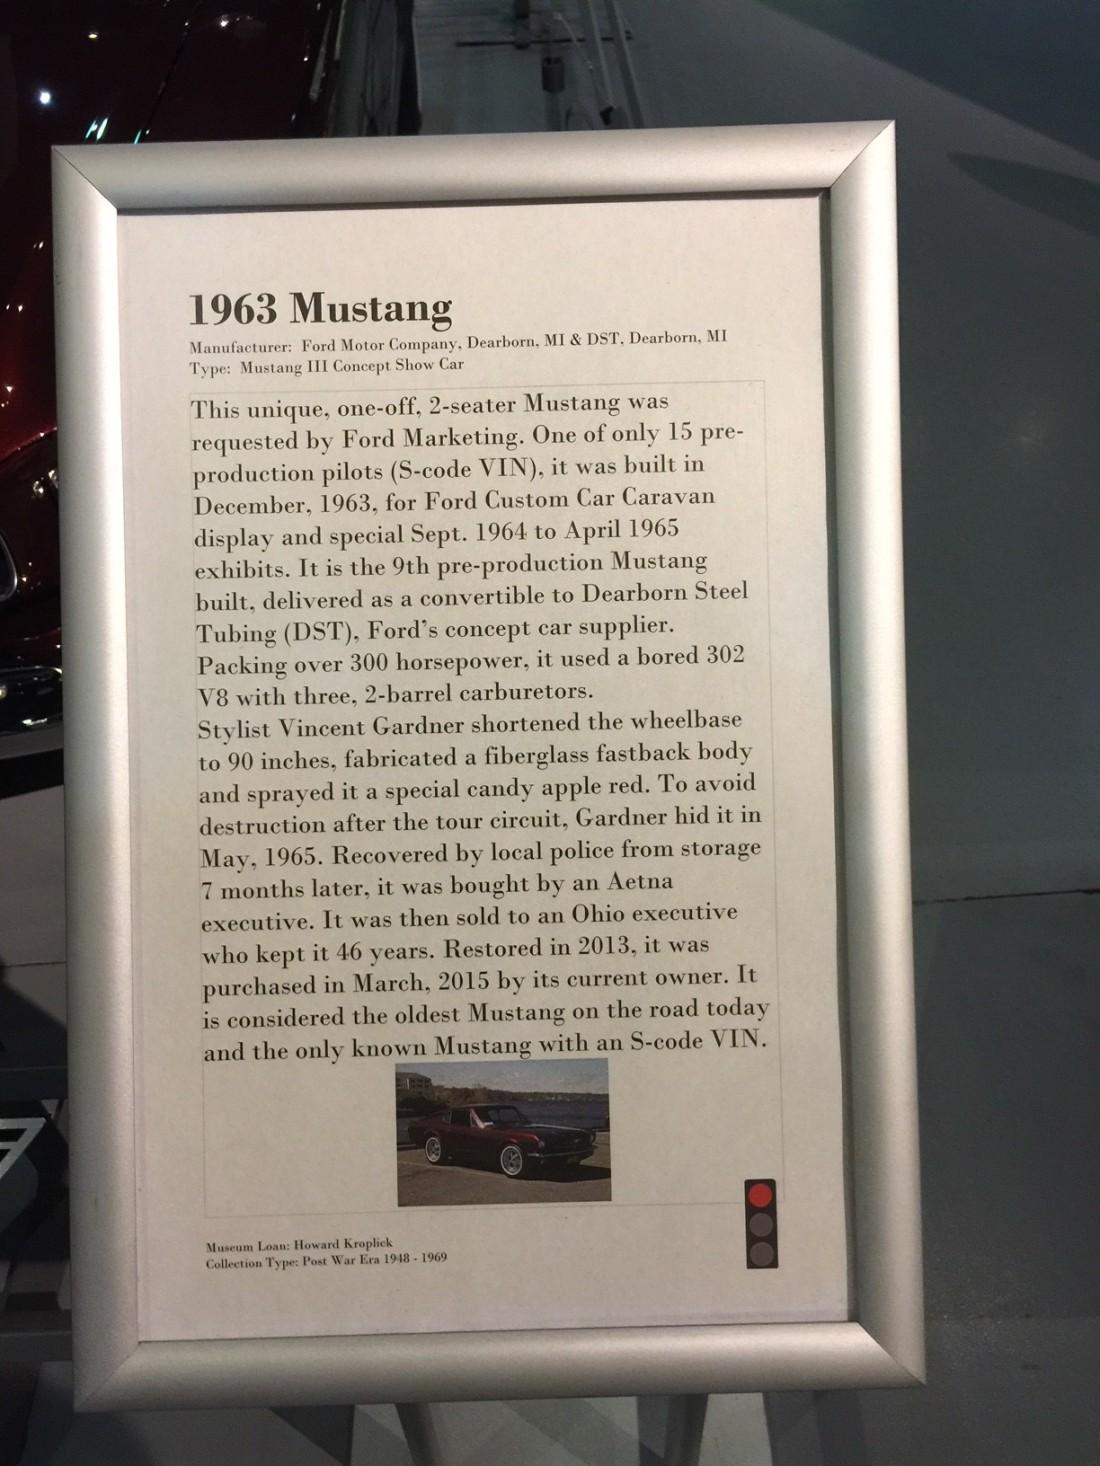 1963 Mustang Text